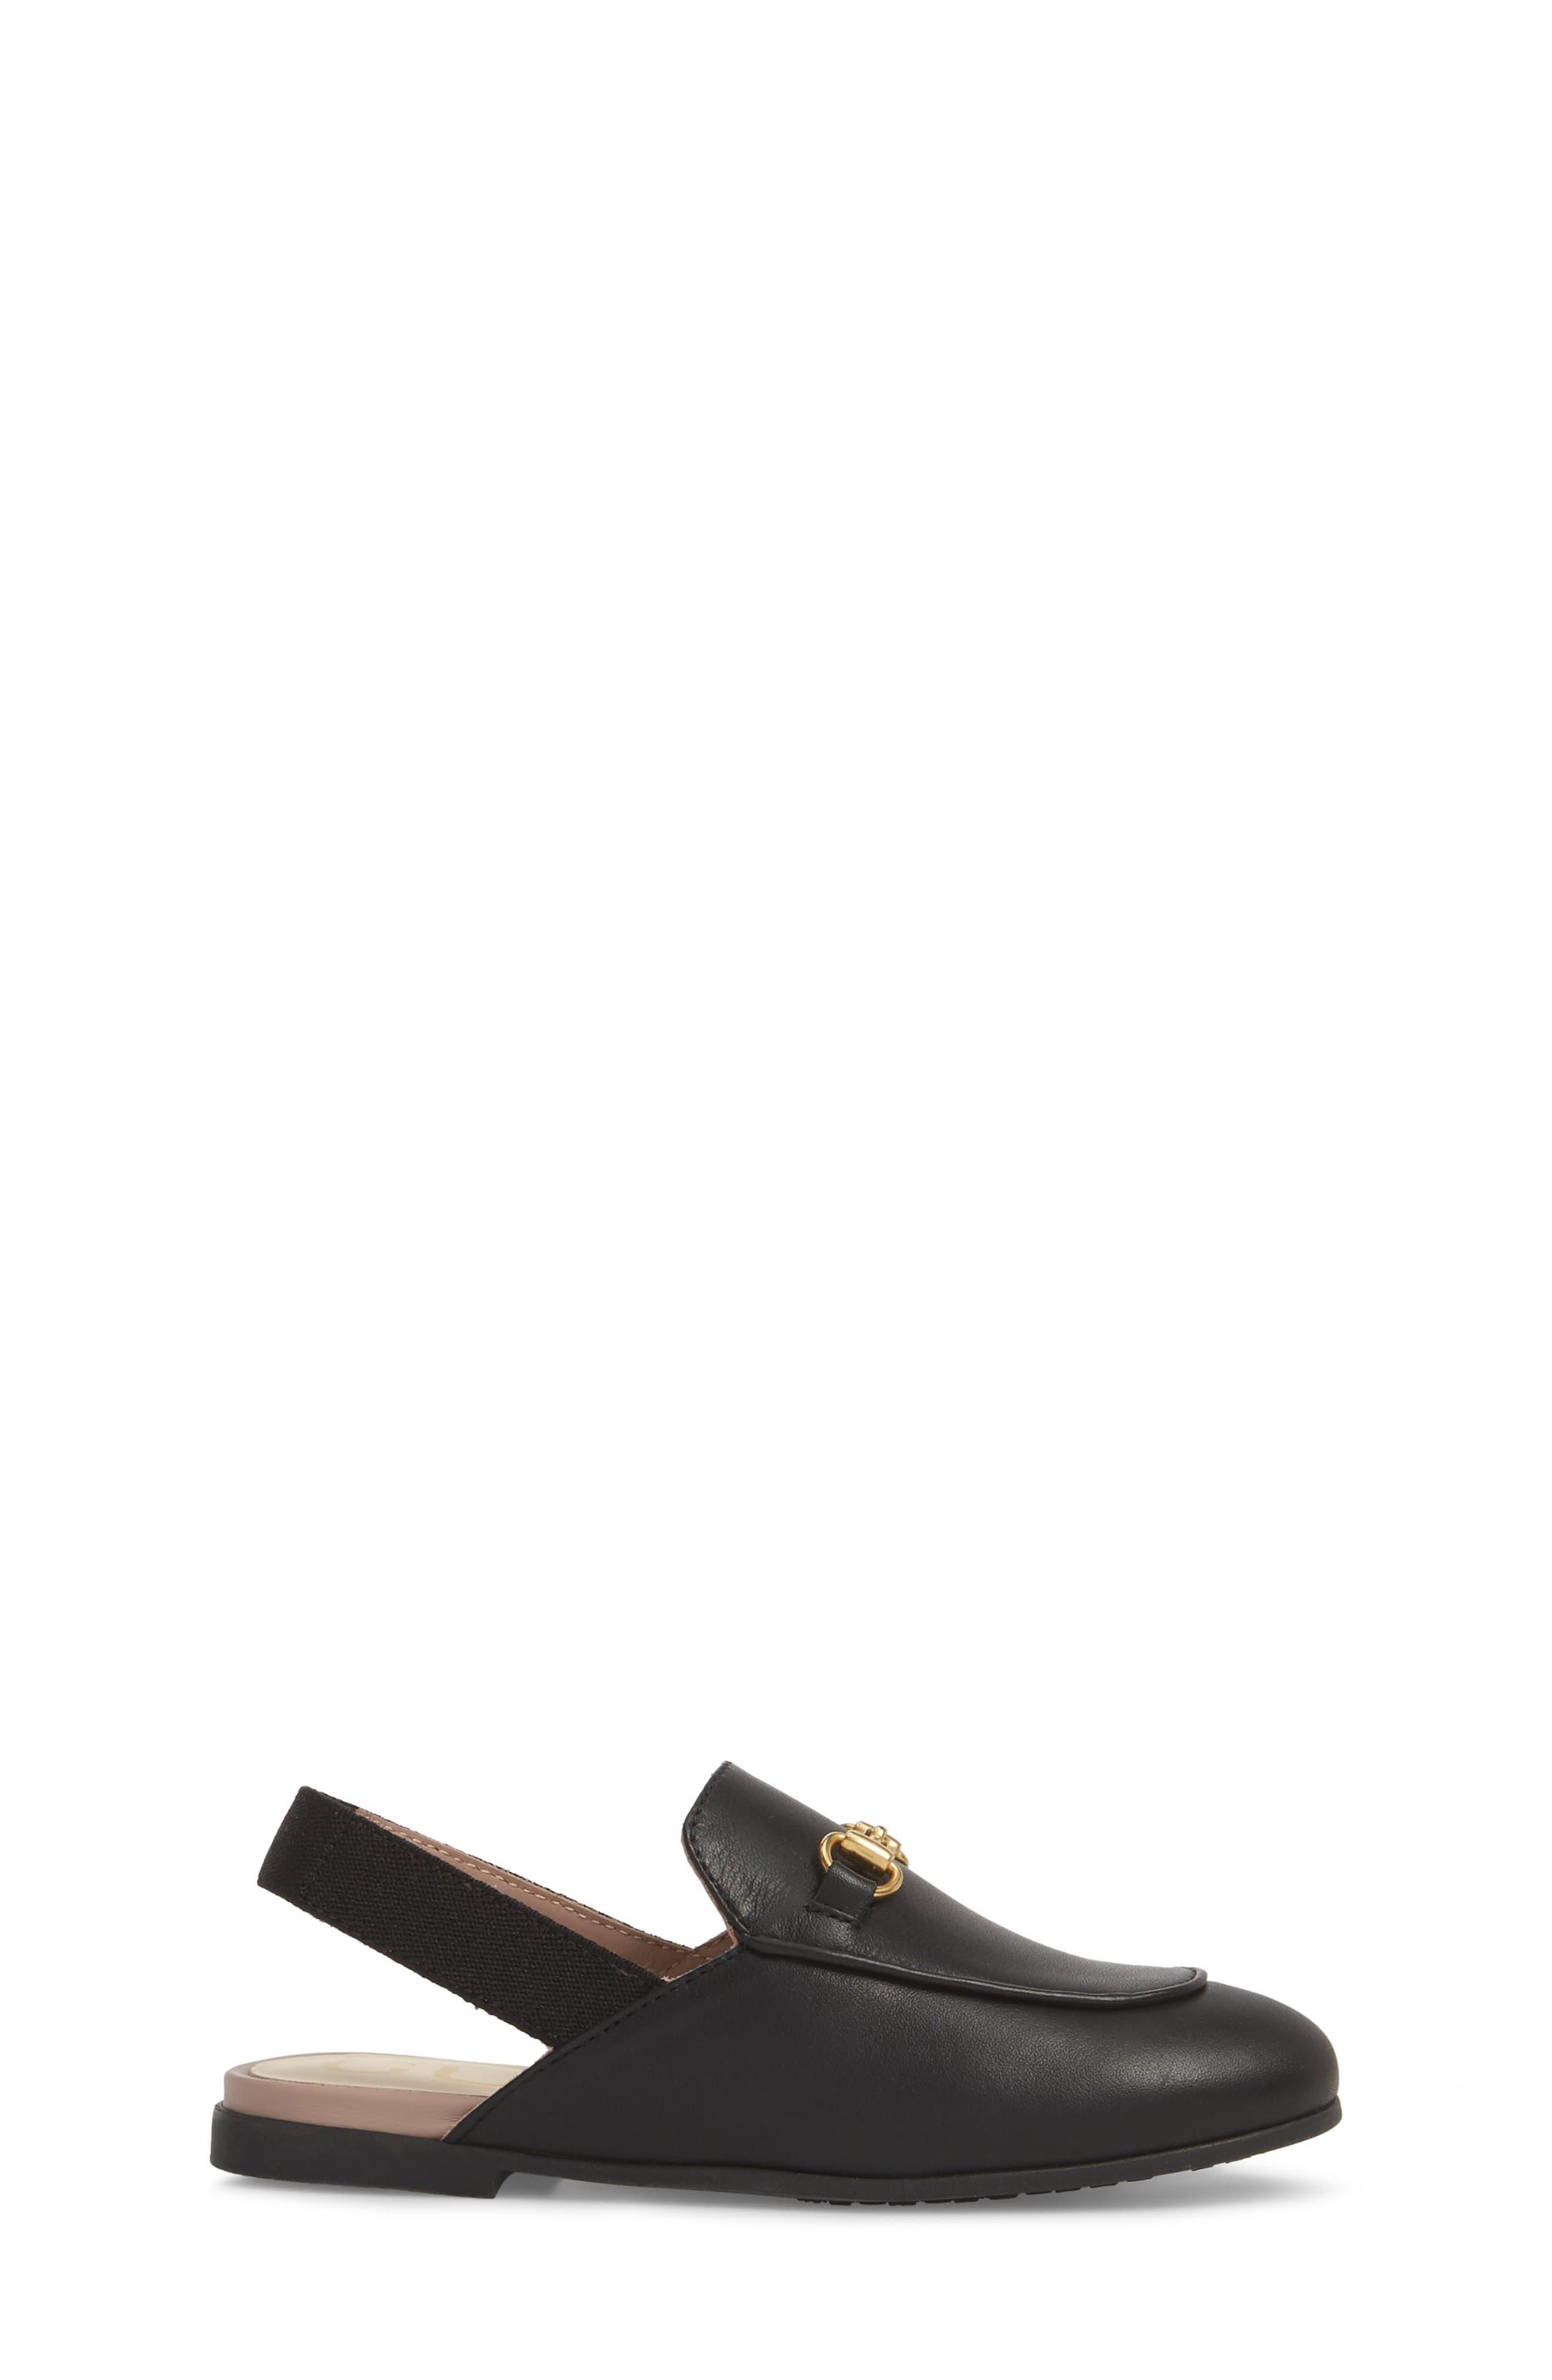 Princetown Loafer Mule,                             Alternate thumbnail 3, color,                             BLACK/ BLACK